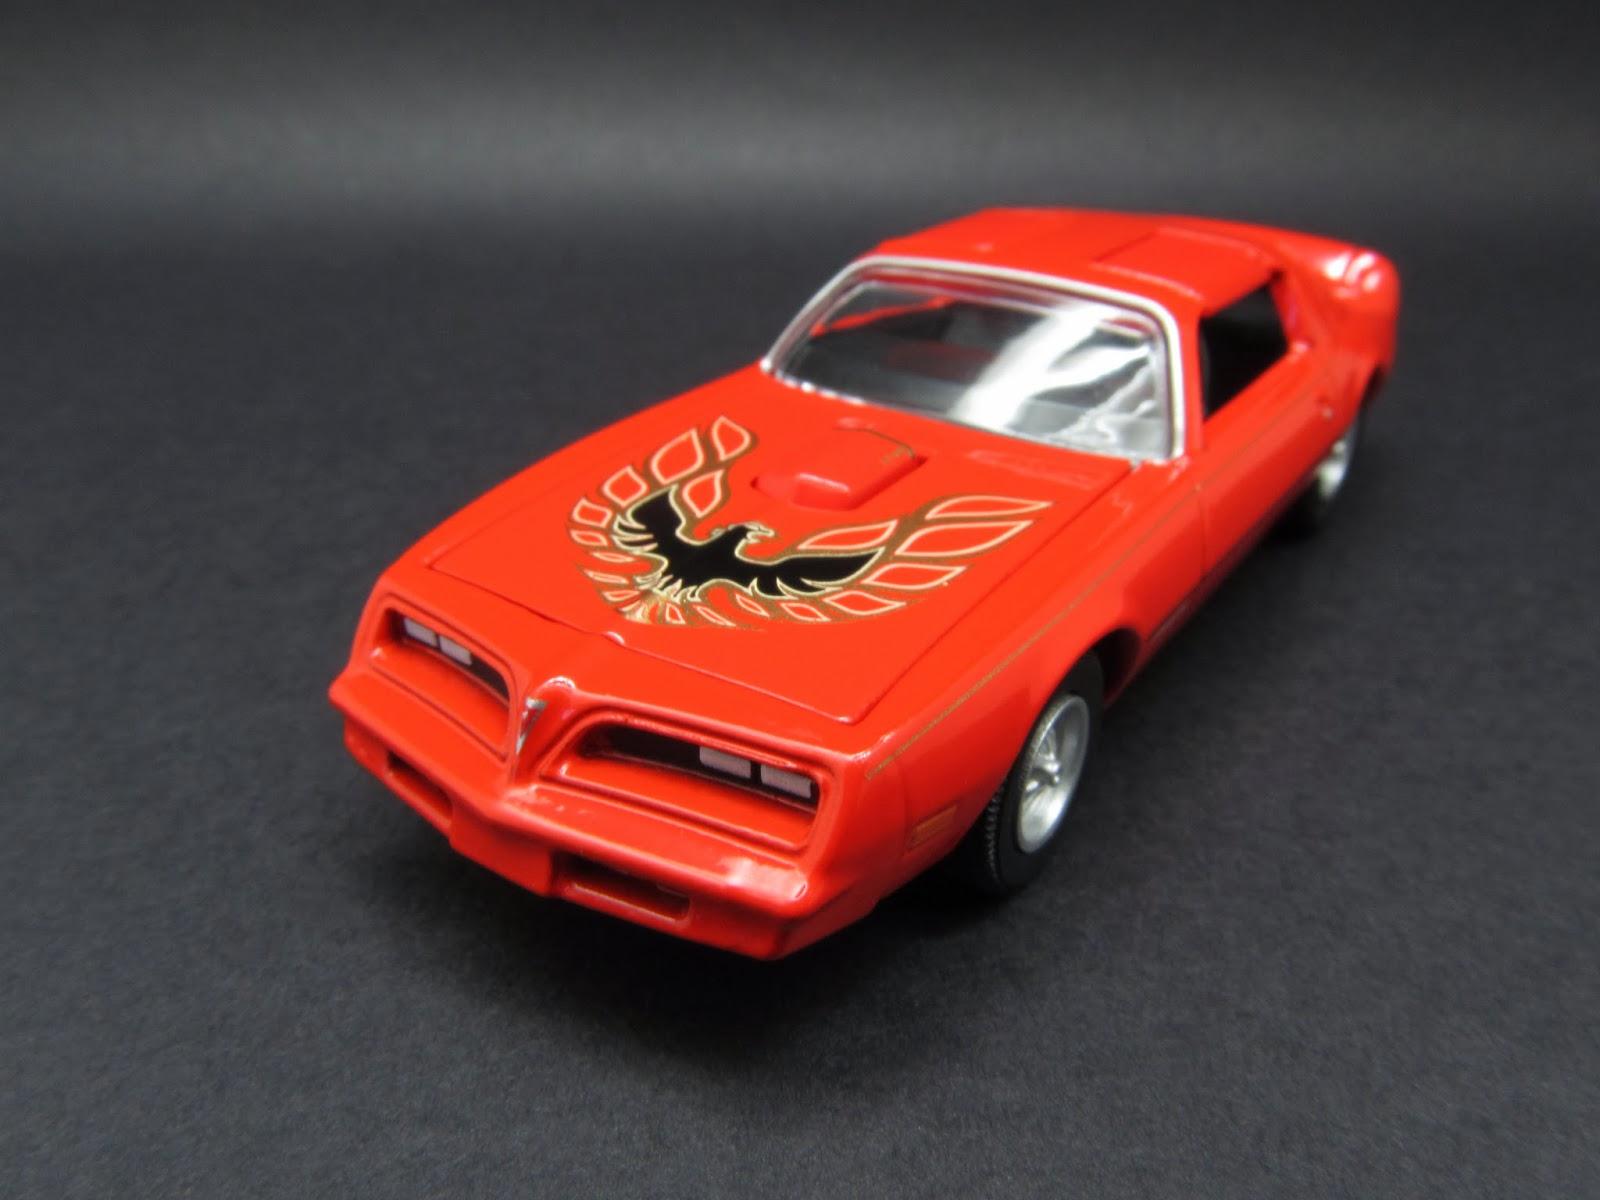 Diecast Hobbist: 1977 Pontiac Firebird Trans Am - Old School (2003)